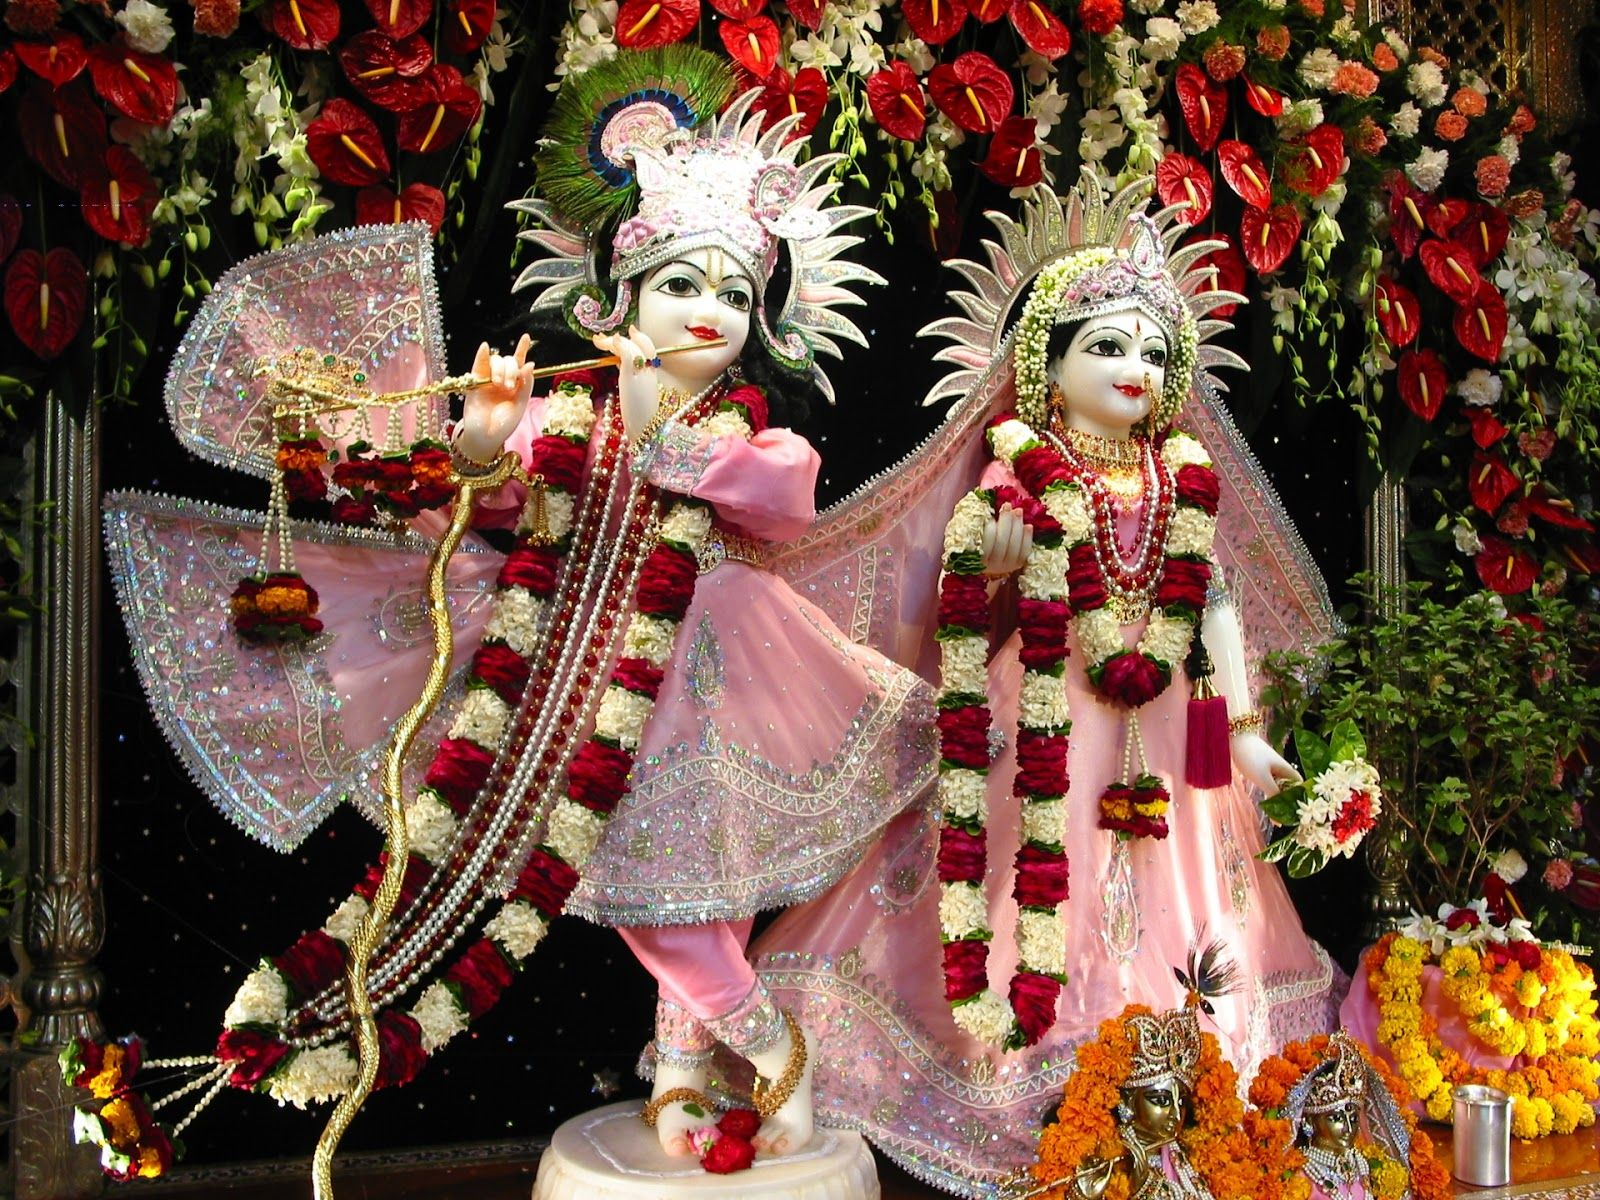 Best Hd Photos Of Radha Krishna Blessings Festival Chaska Lord Krishna Hd Wallpaper Lord Krishna Wallpapers Radha Krishna Wallpaper